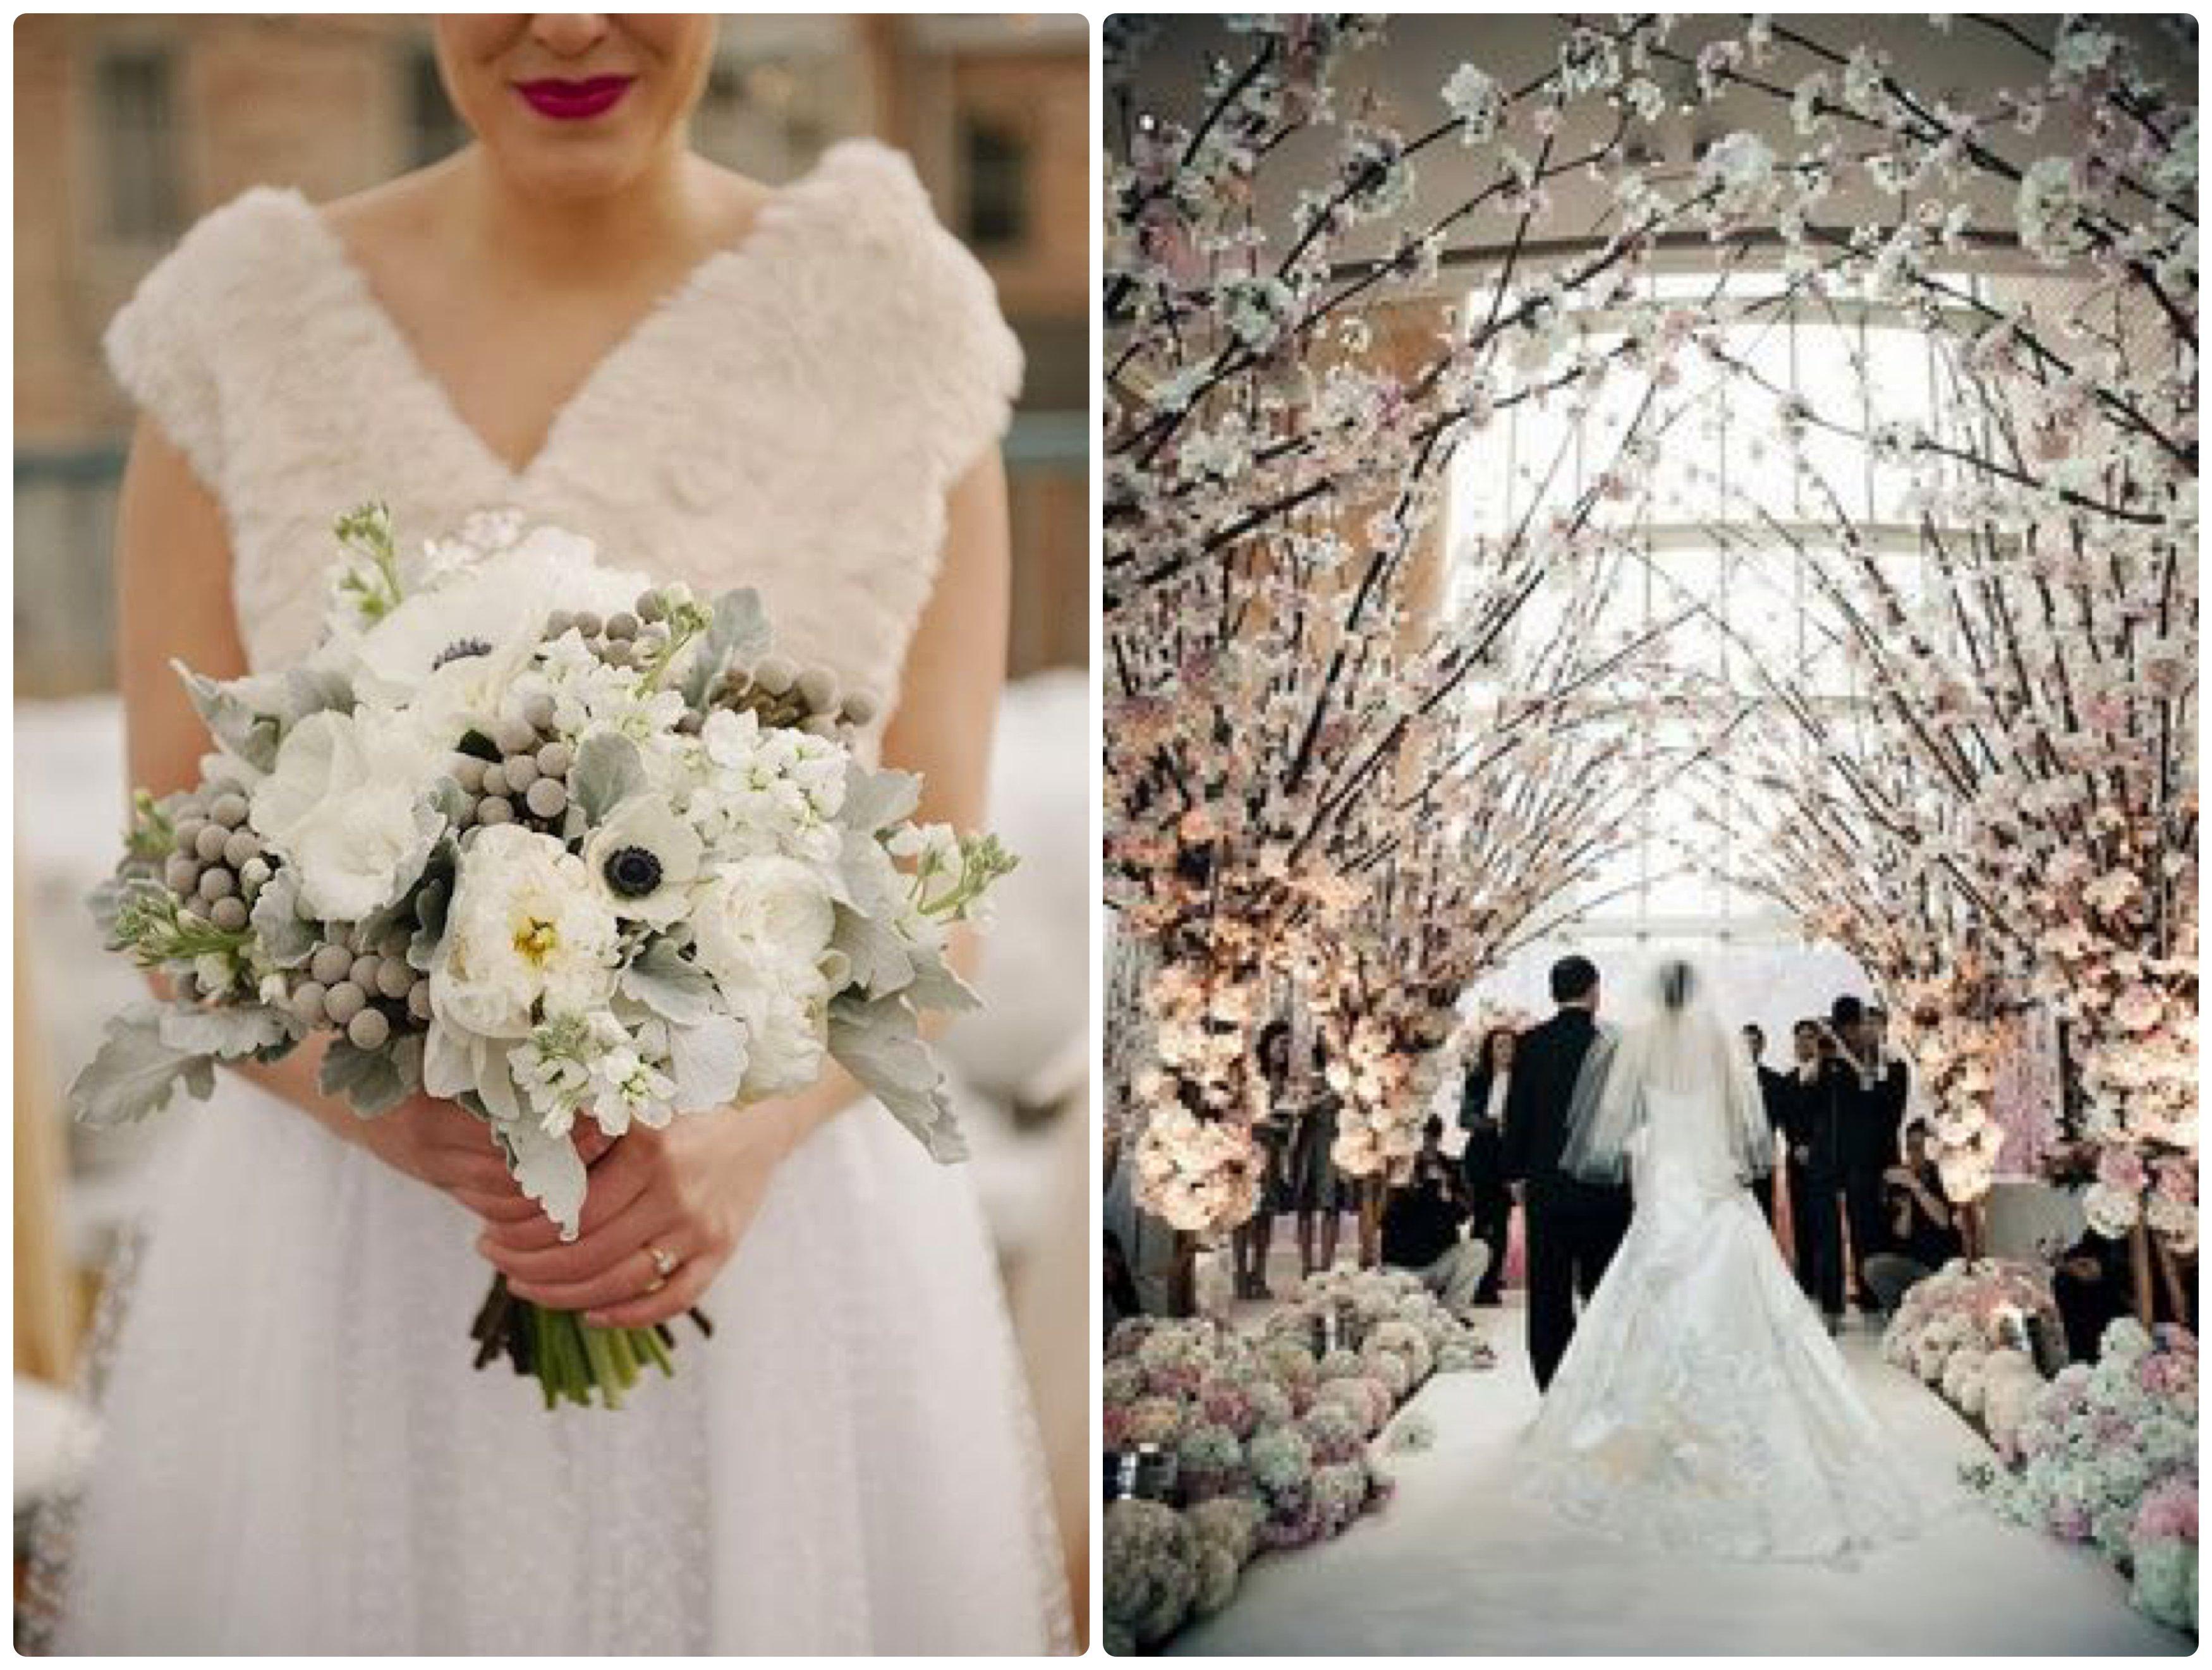 Winter wedding 3 2 the urban diva style blog by gia winter wedding 3 2 junglespirit Gallery